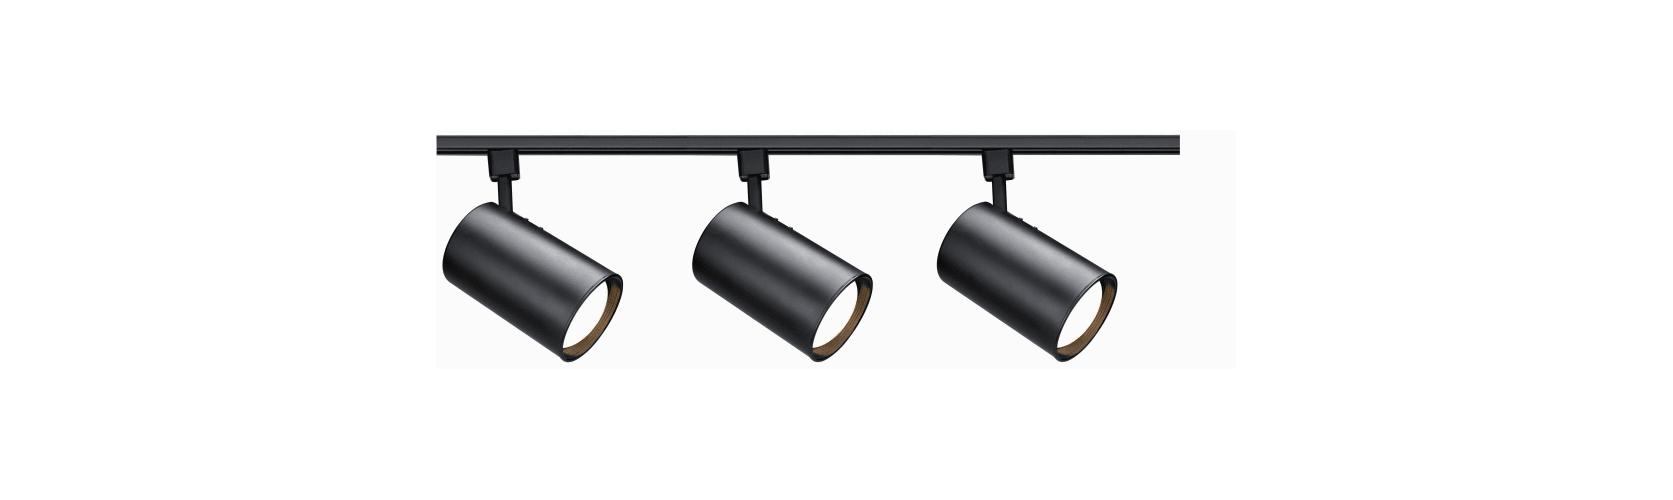 Nuvo Lighting TK319 Black Track Lighting Three Light R30 Straight Cylinder Track Kit in Black Finish